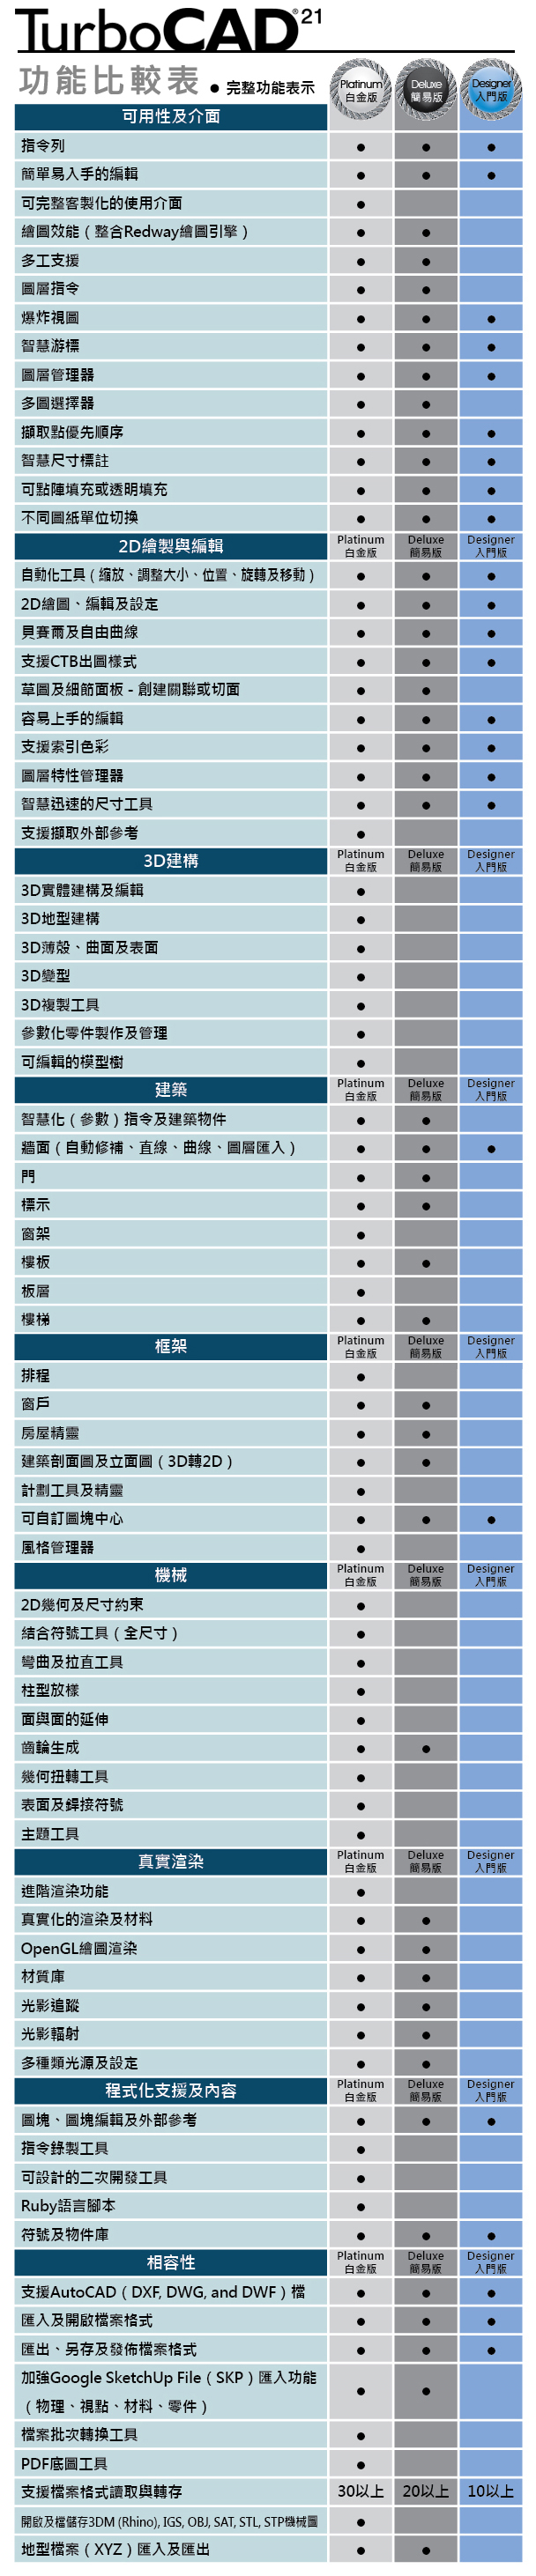 TurboCAD 功能比較表